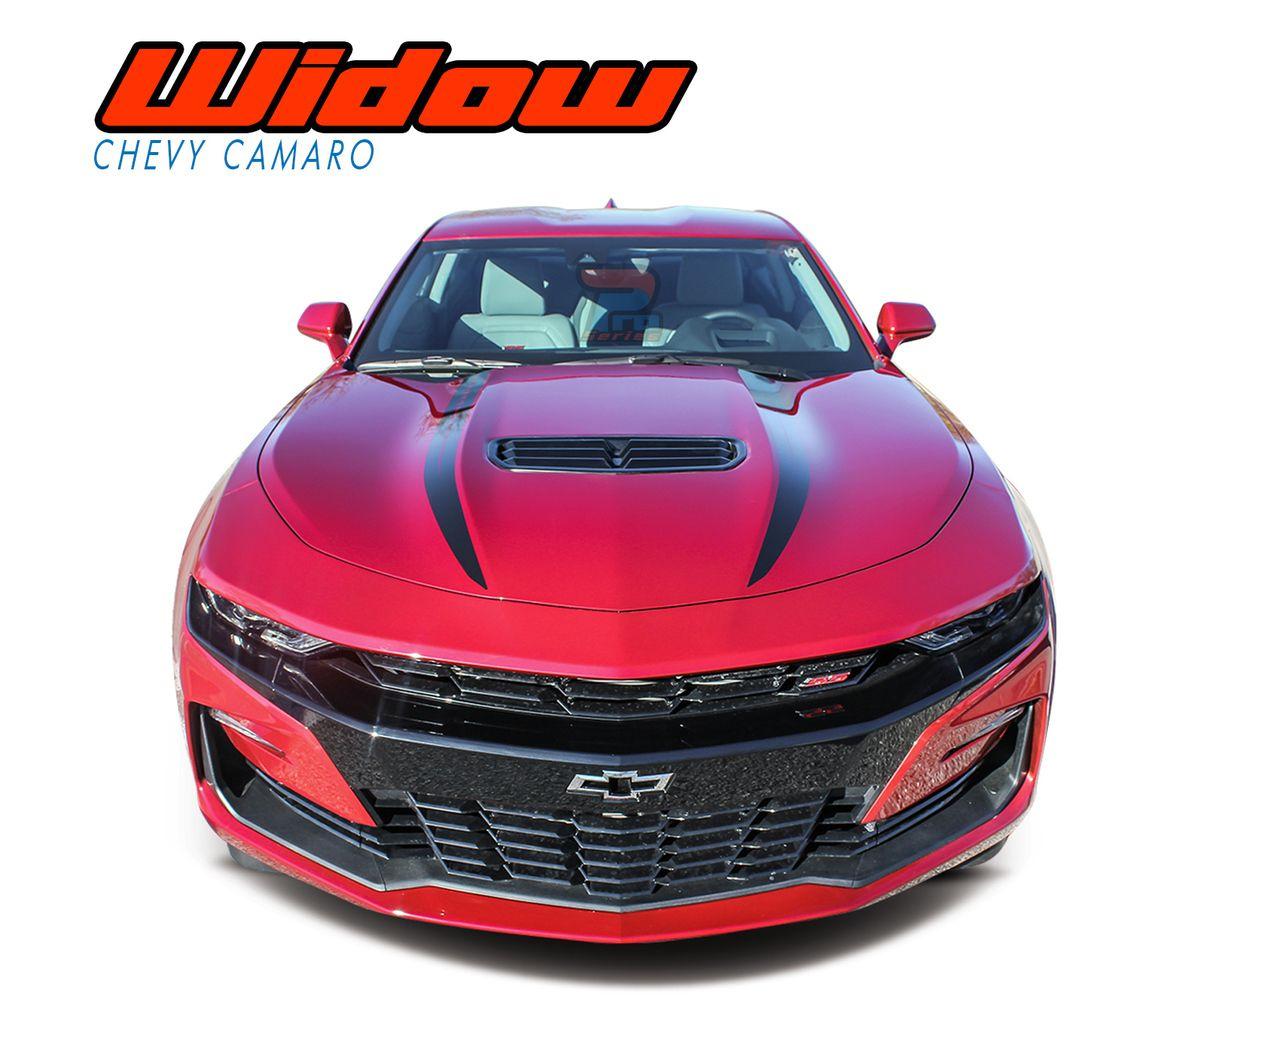 Widow 2019 2020 Chevy Camaro Spider Stripes Hood Spear Decals Vinyl Graphics Kit Chevy Camaro Camaro Vinyl Graphics